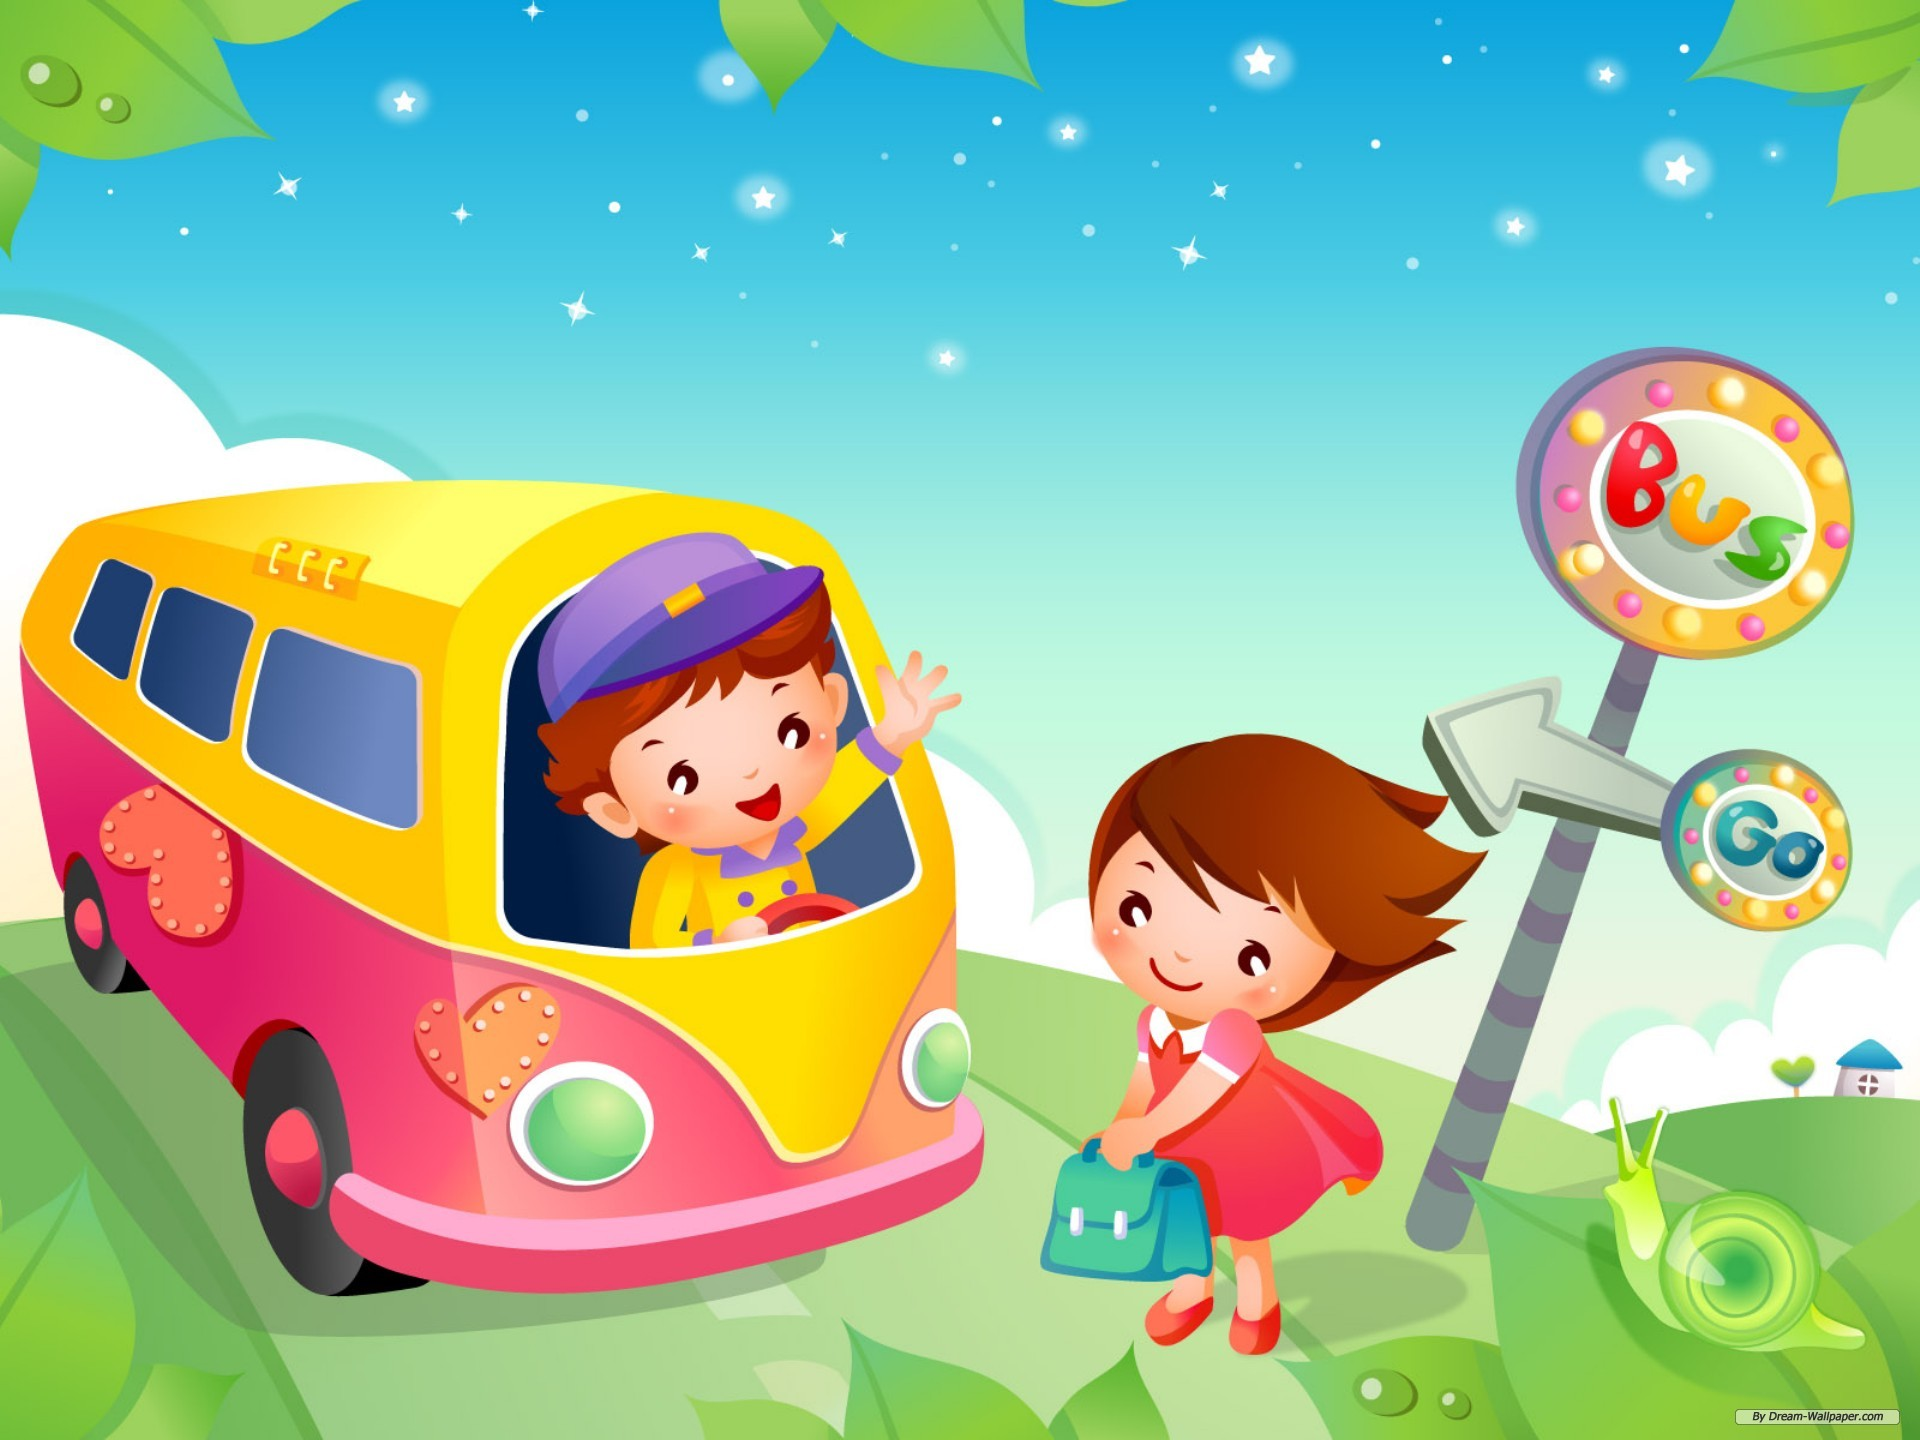 Kids Cartoons: Latest Kids Cartoon HD Wallpaper & Video Free